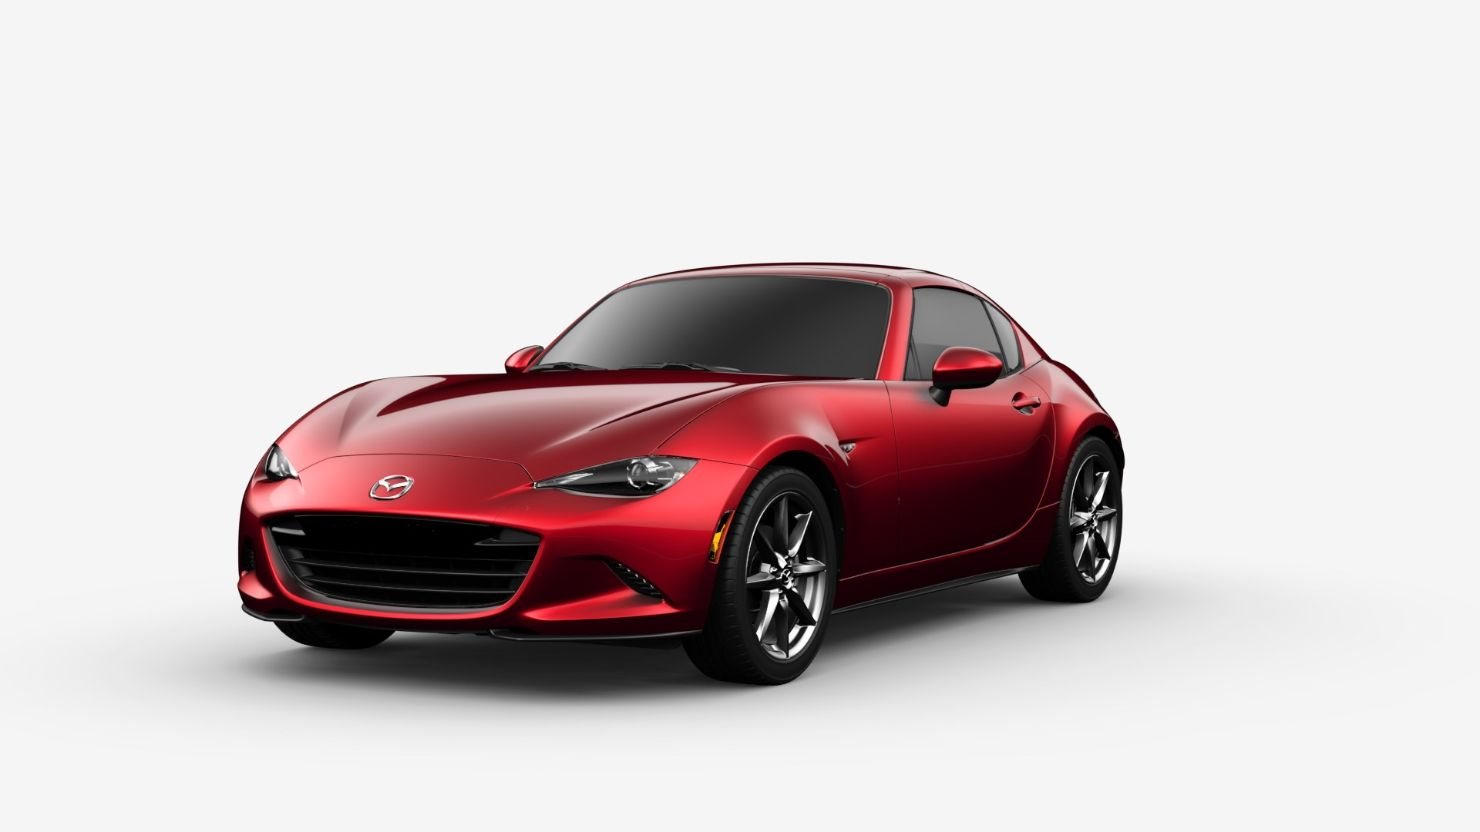 2017 Mazda MX5 Miata RF Hard Top Convertible Mazda USA